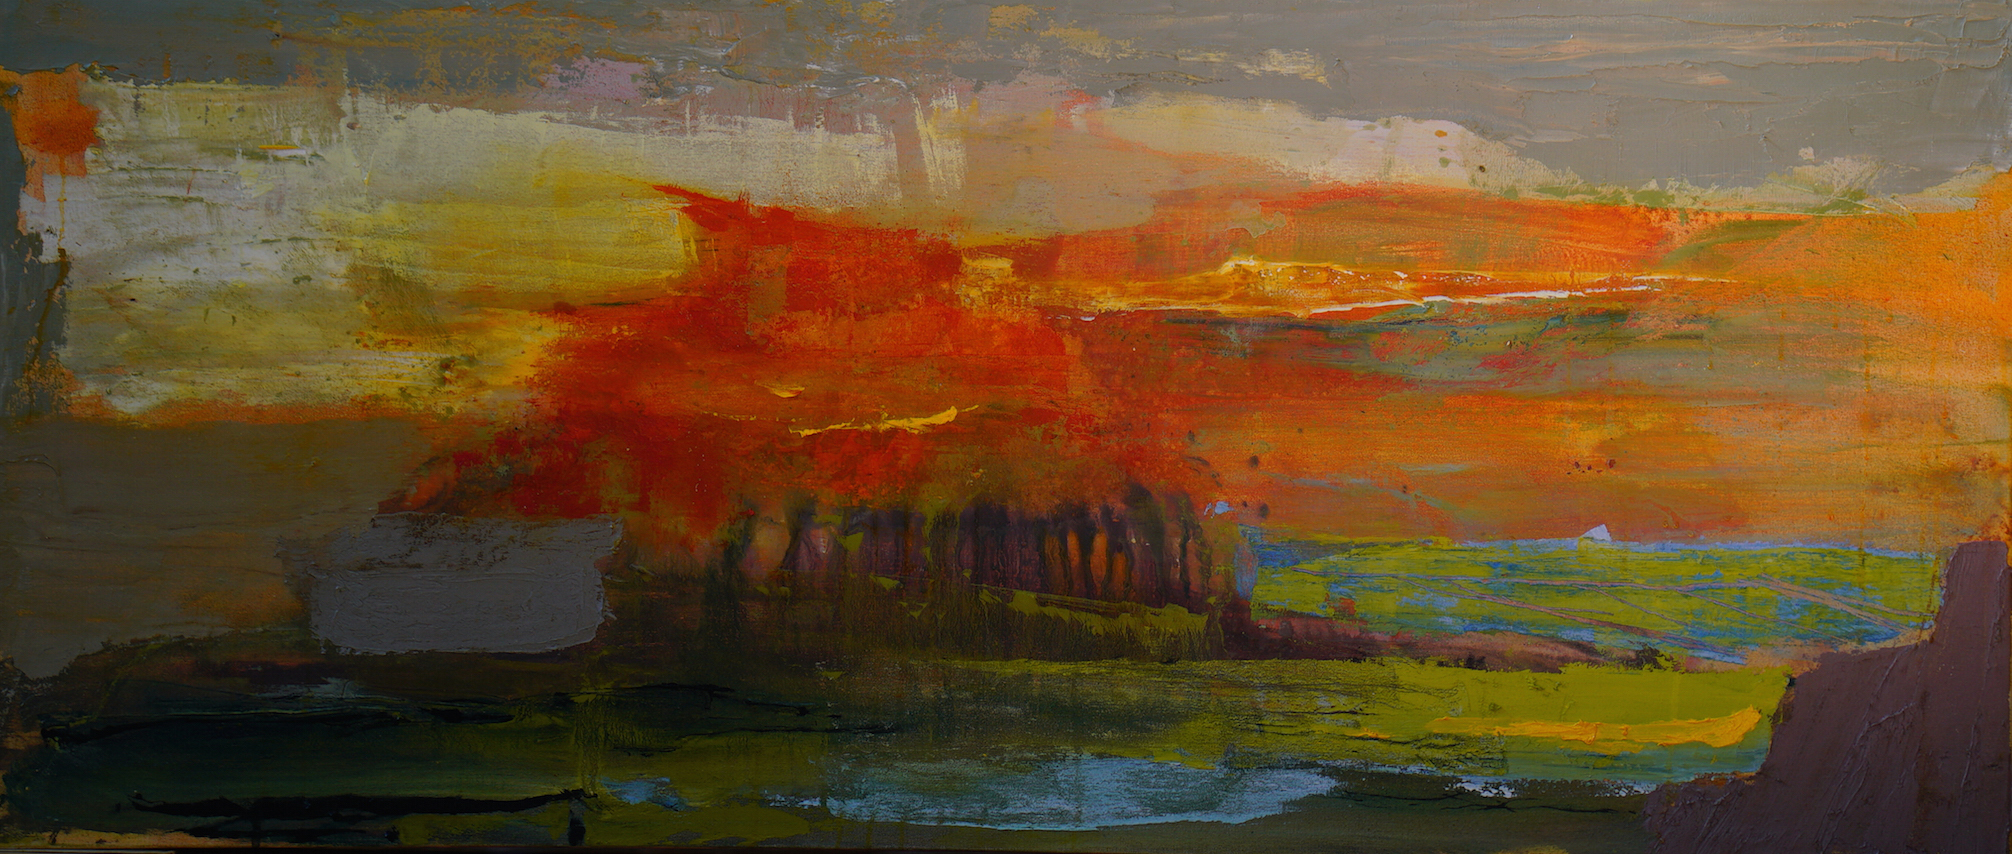 "oil on canvas, 2016, 24"" x 54"""